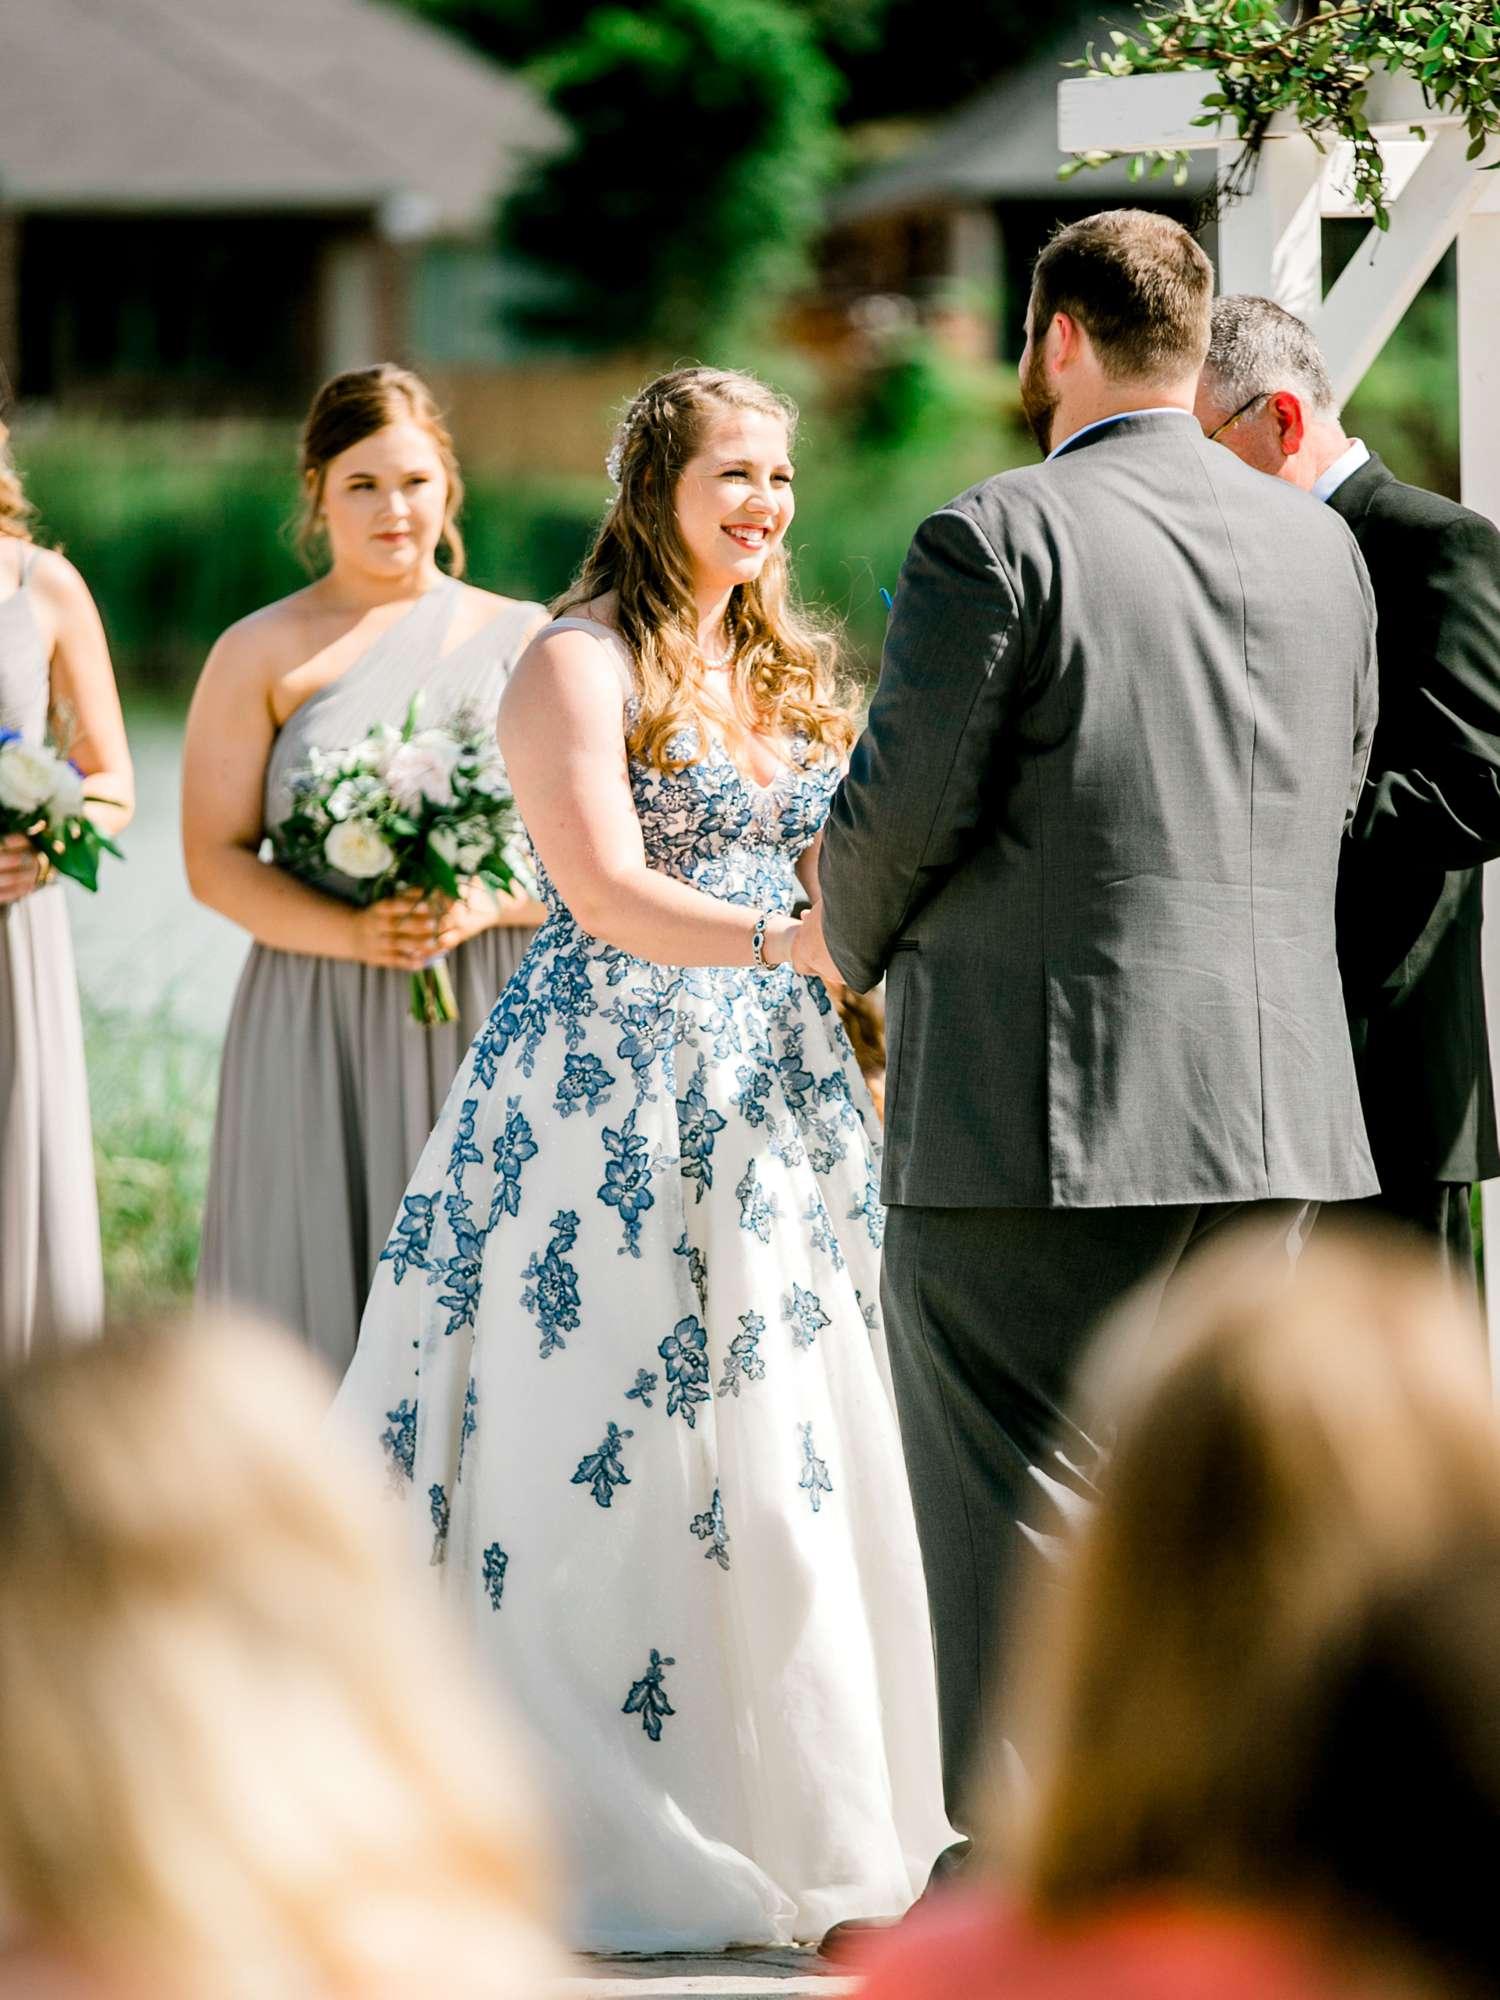 TY+NATHAN+HALLIER+ALLEEJ+WEDDING+PHOTOGRAPHER+RANSOM+CANYON_0074.jpg